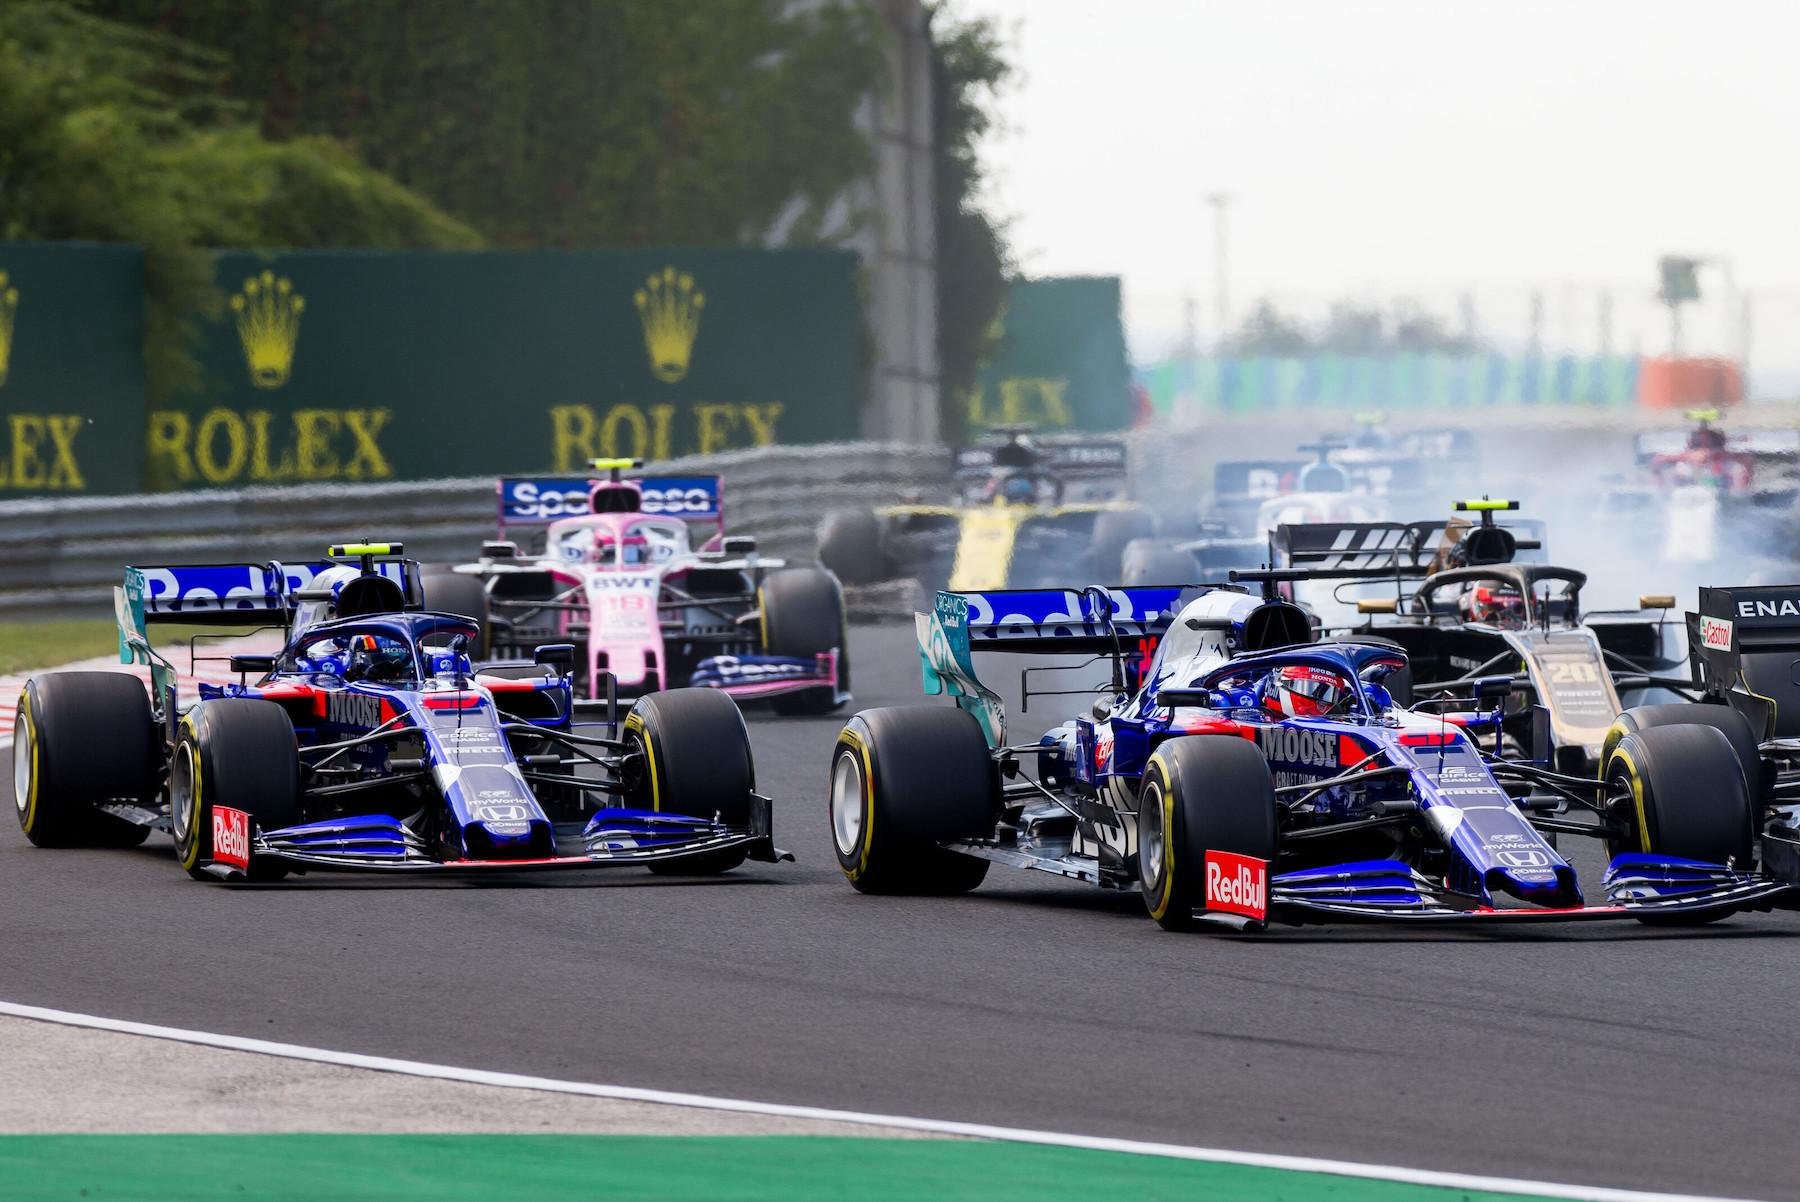 6 2019 Hungarian GP Sunday 58.jpg